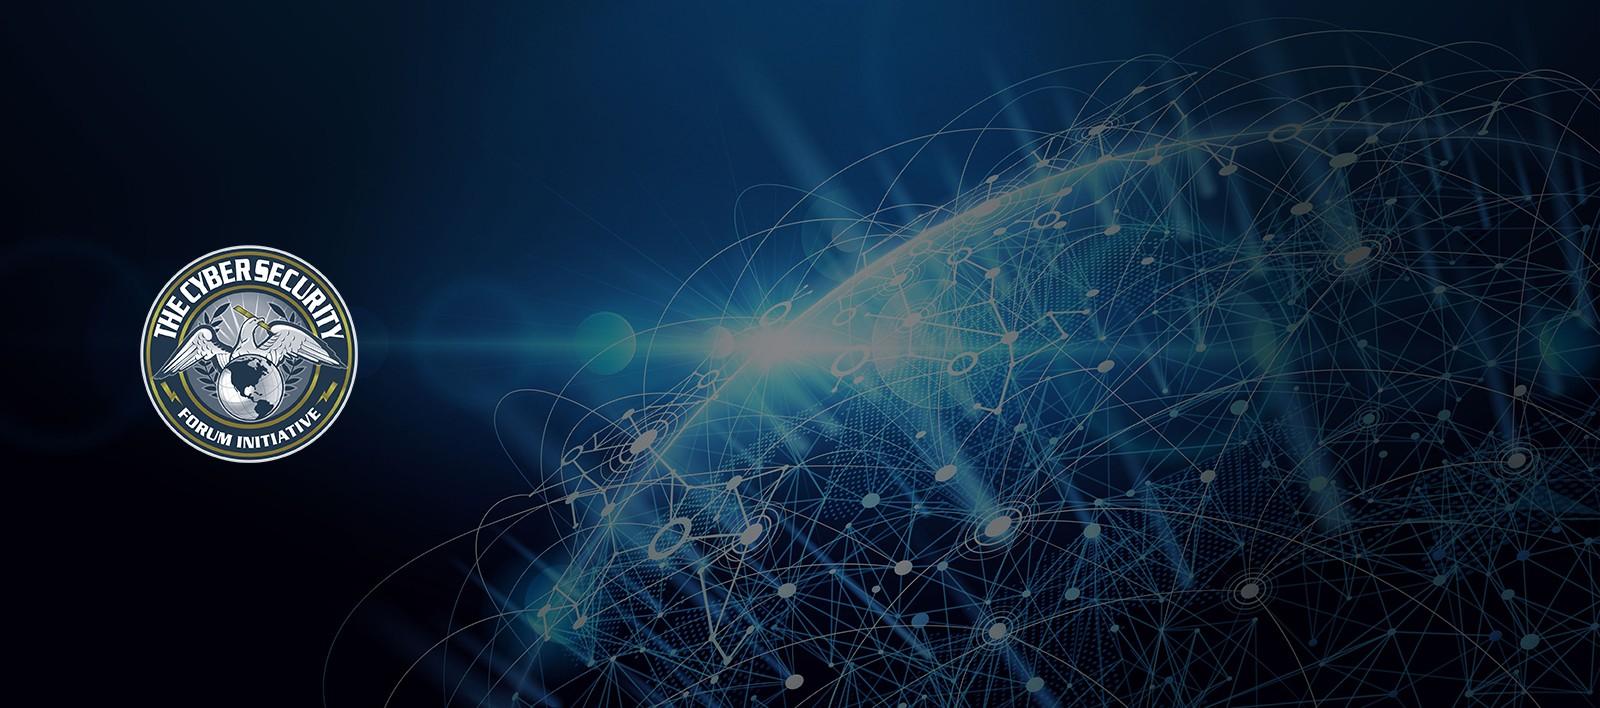 Cyber Security Forum Initiative | LinkedIn